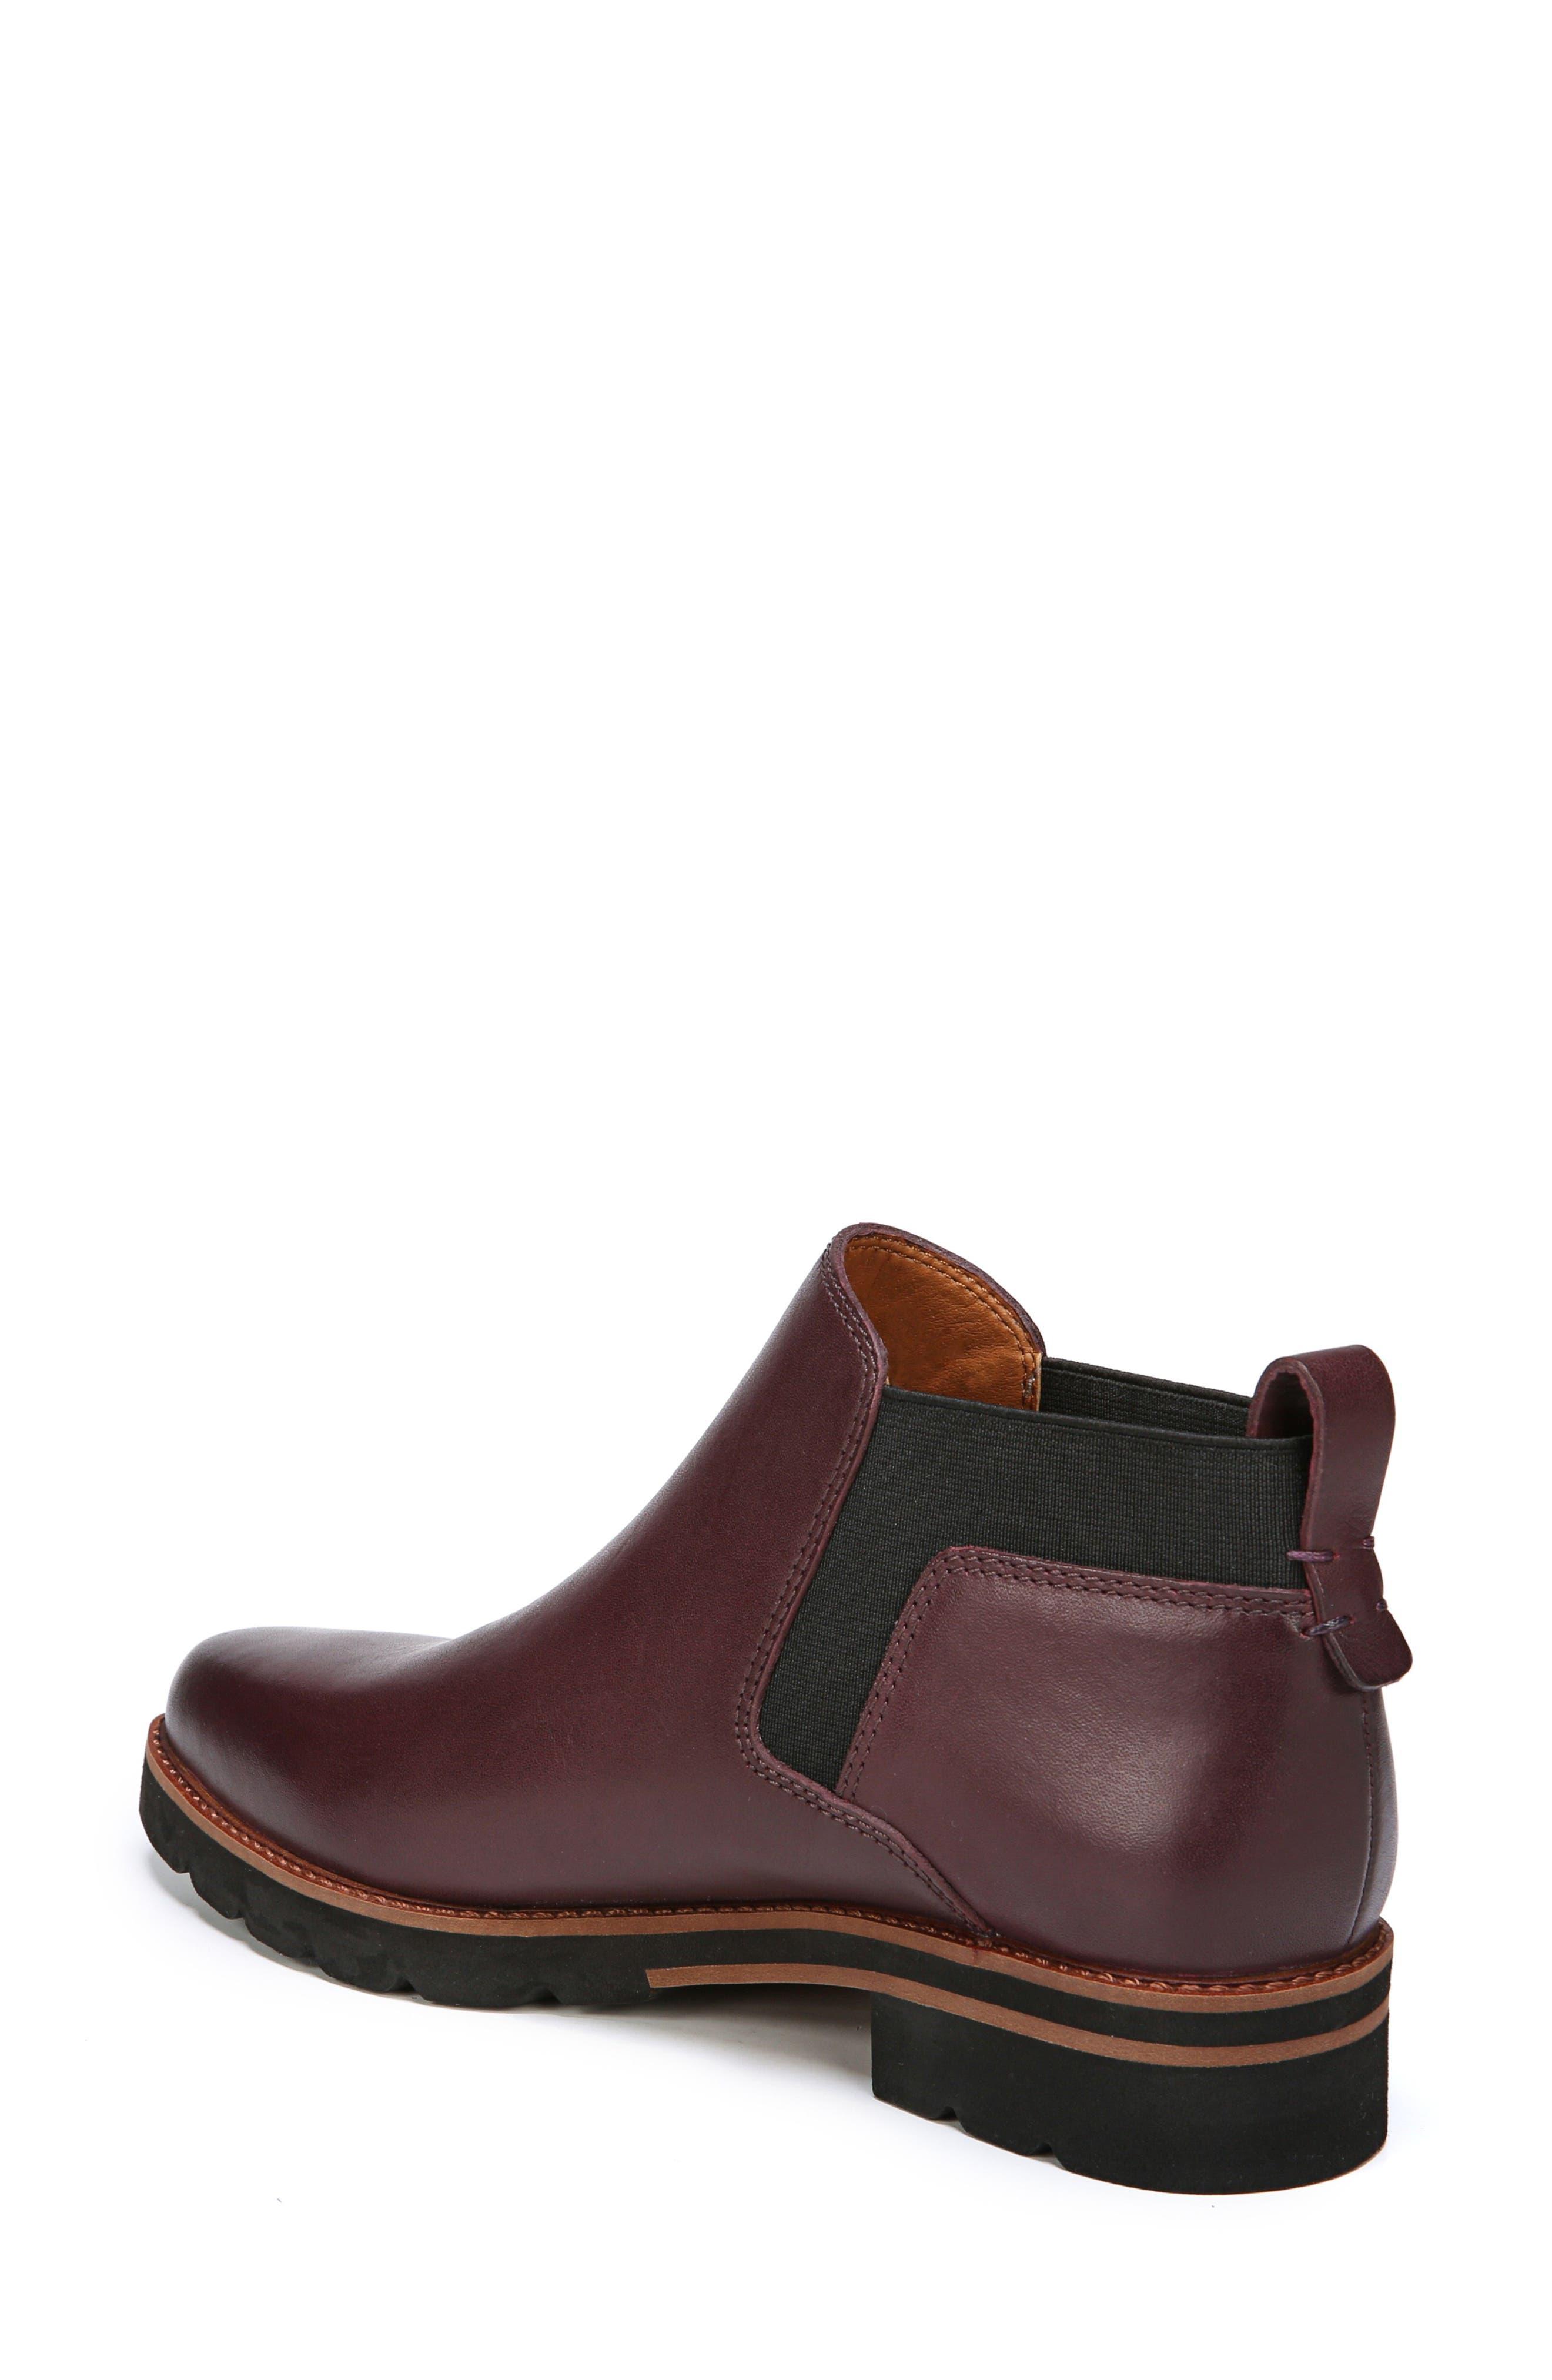 Bringham Bootie,                             Alternate thumbnail 2, color,                             Dark Burgundy Leather